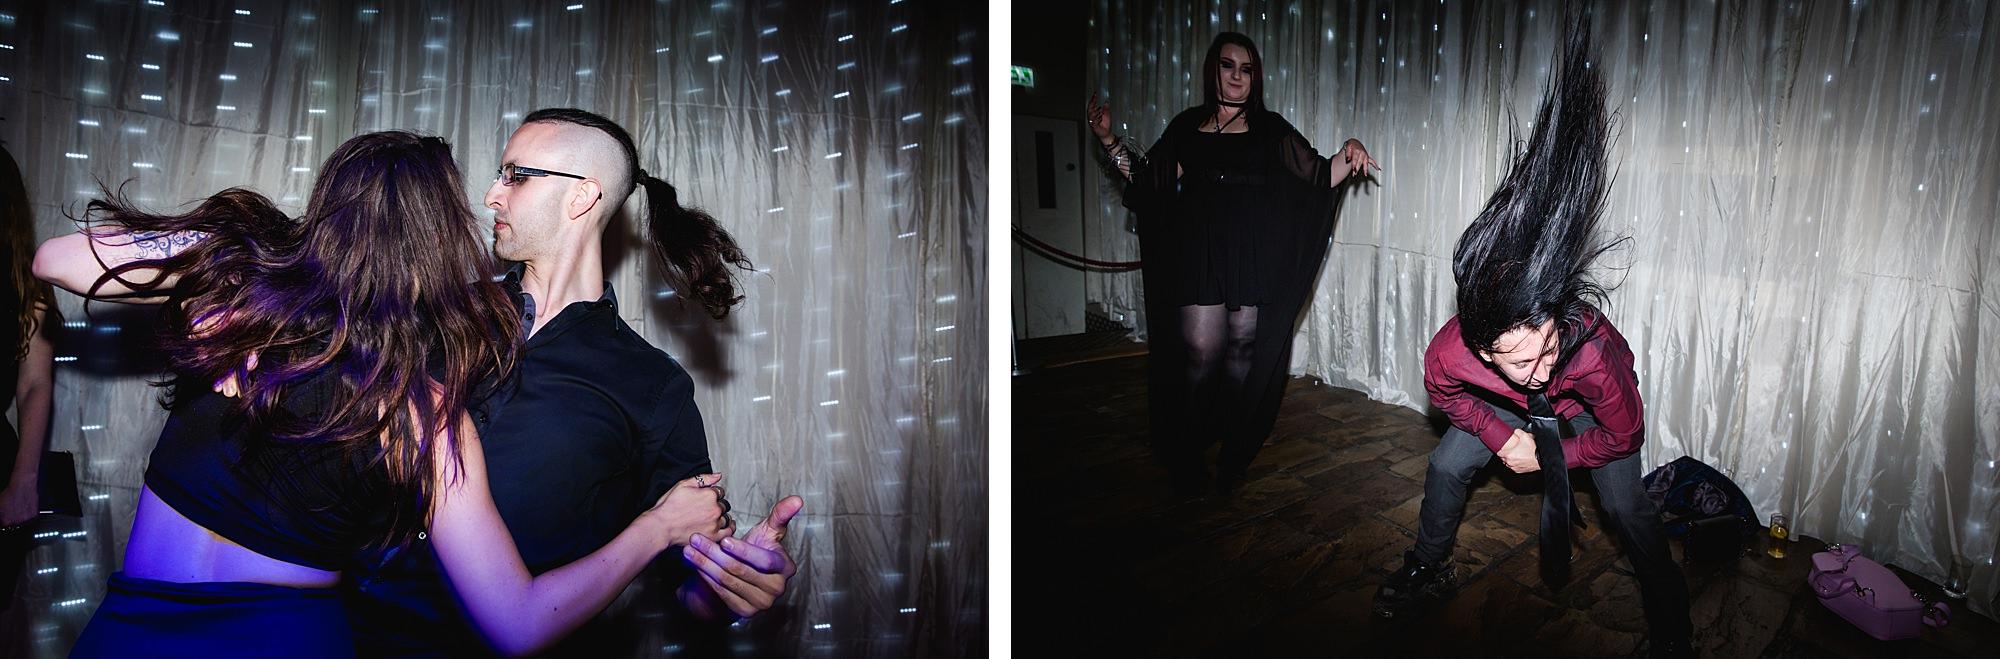 guests dancing at goth wedding london